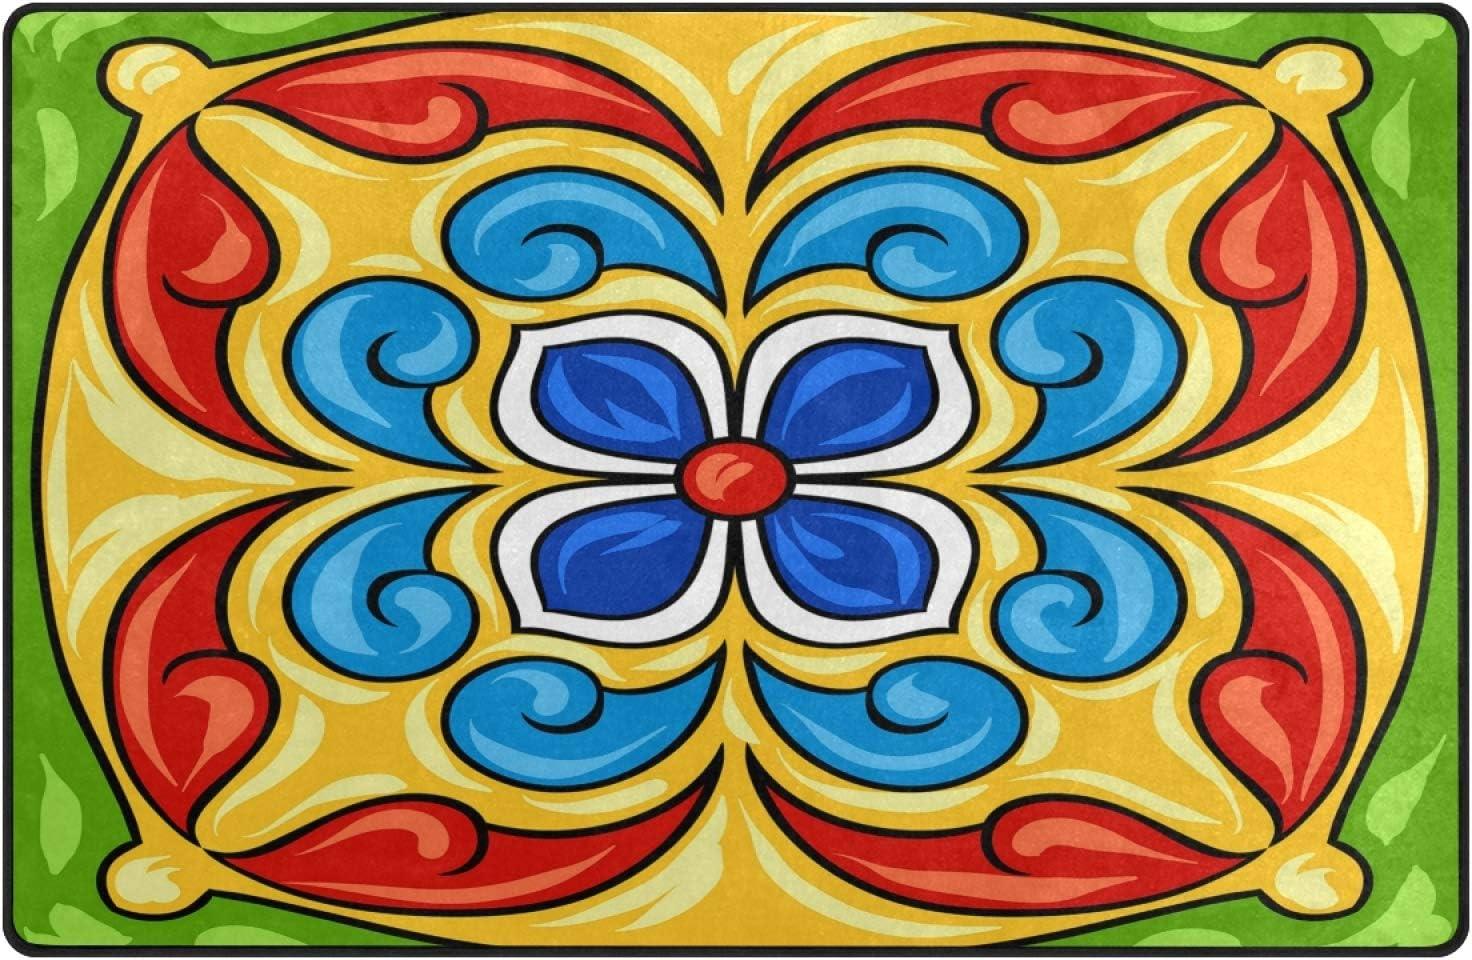 Oyihfvs オンラインショップ Mexican Ceramic Tile 100%品質保証 Ethnic R Folk Ornament 63